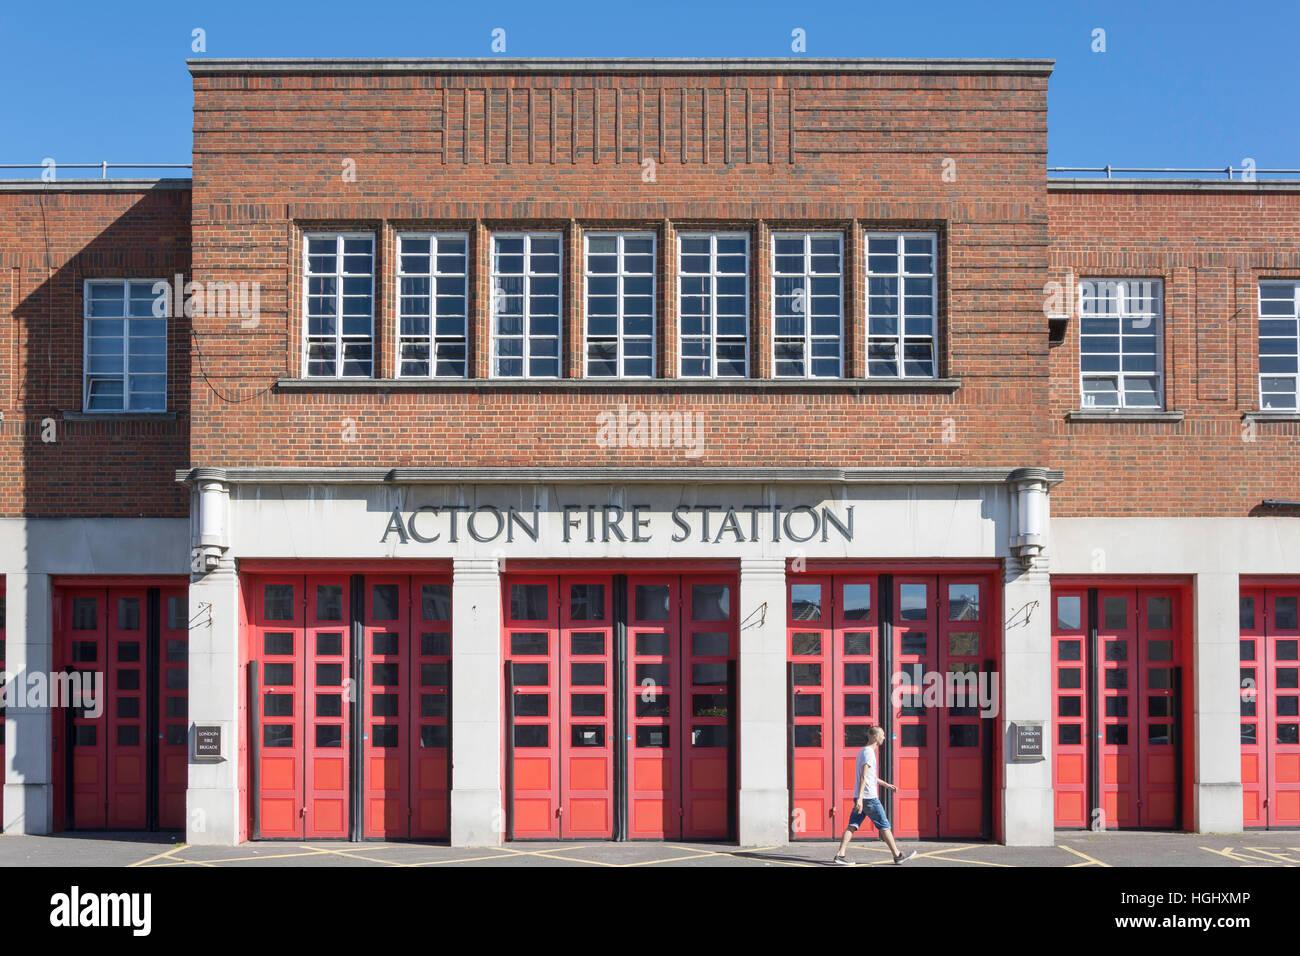 Art Deco Acton Fire Station, Gunnersbury Lane, Acton, London Borough of Ealing, Greater London, England, United - Stock Image